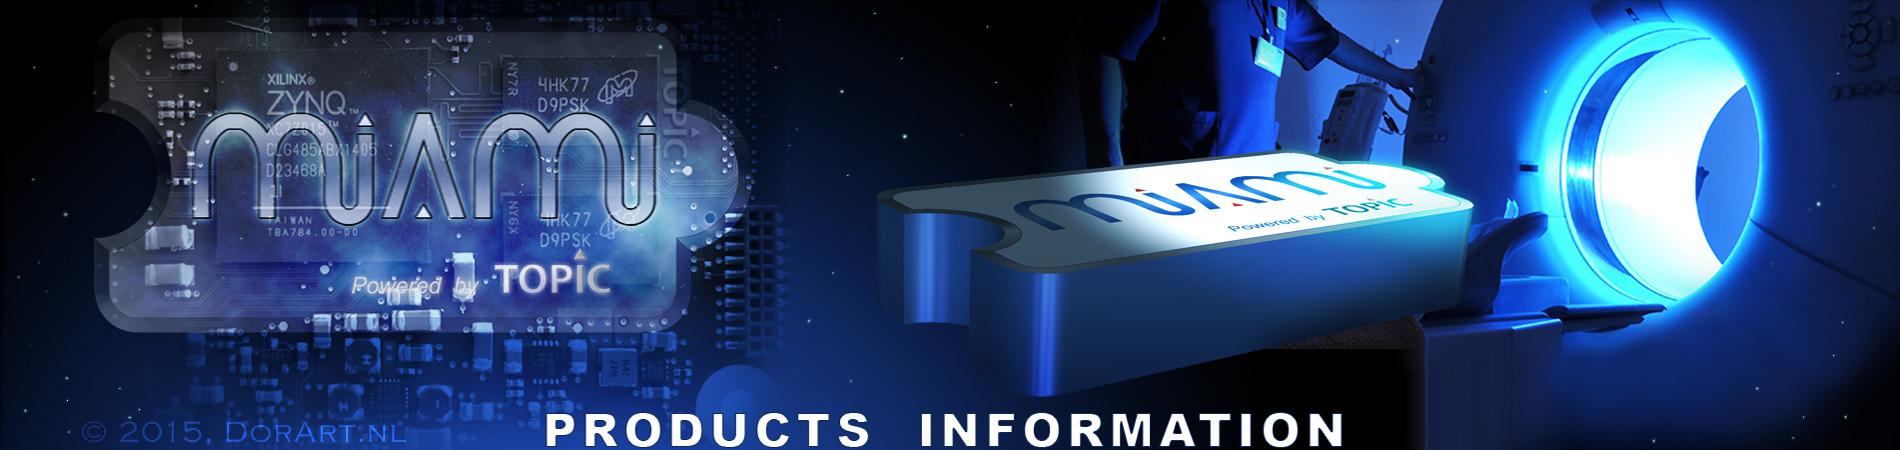 TEP Info header, 2015